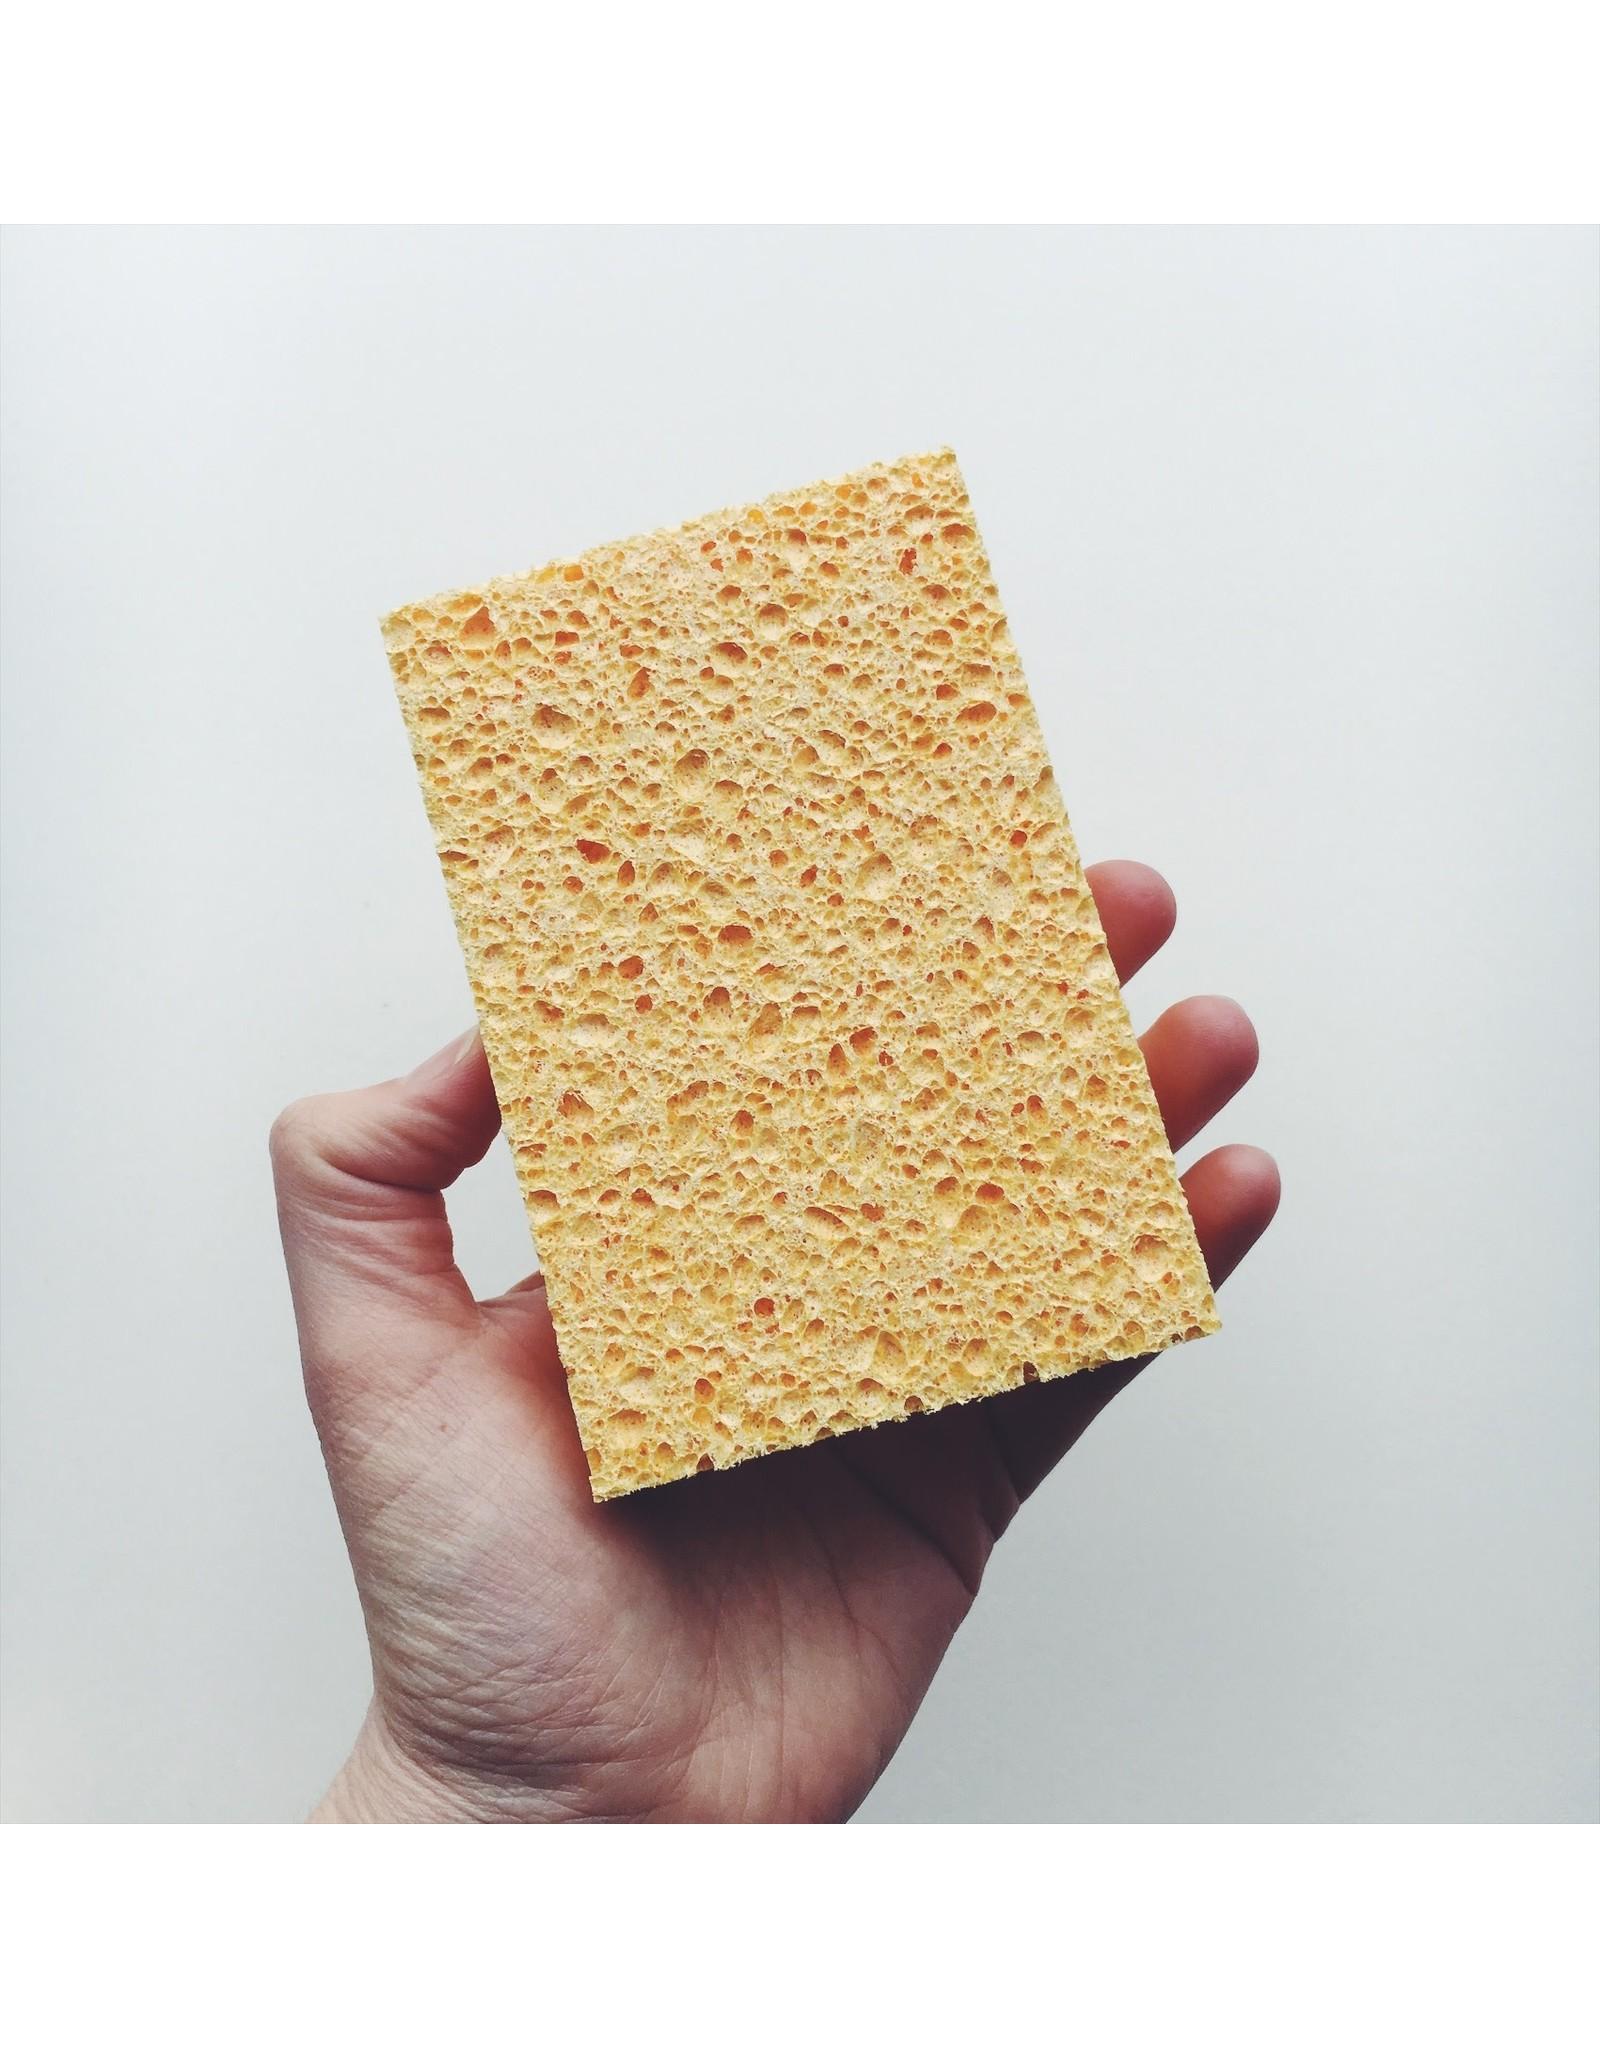 Biodegradable Cellulose Sponge